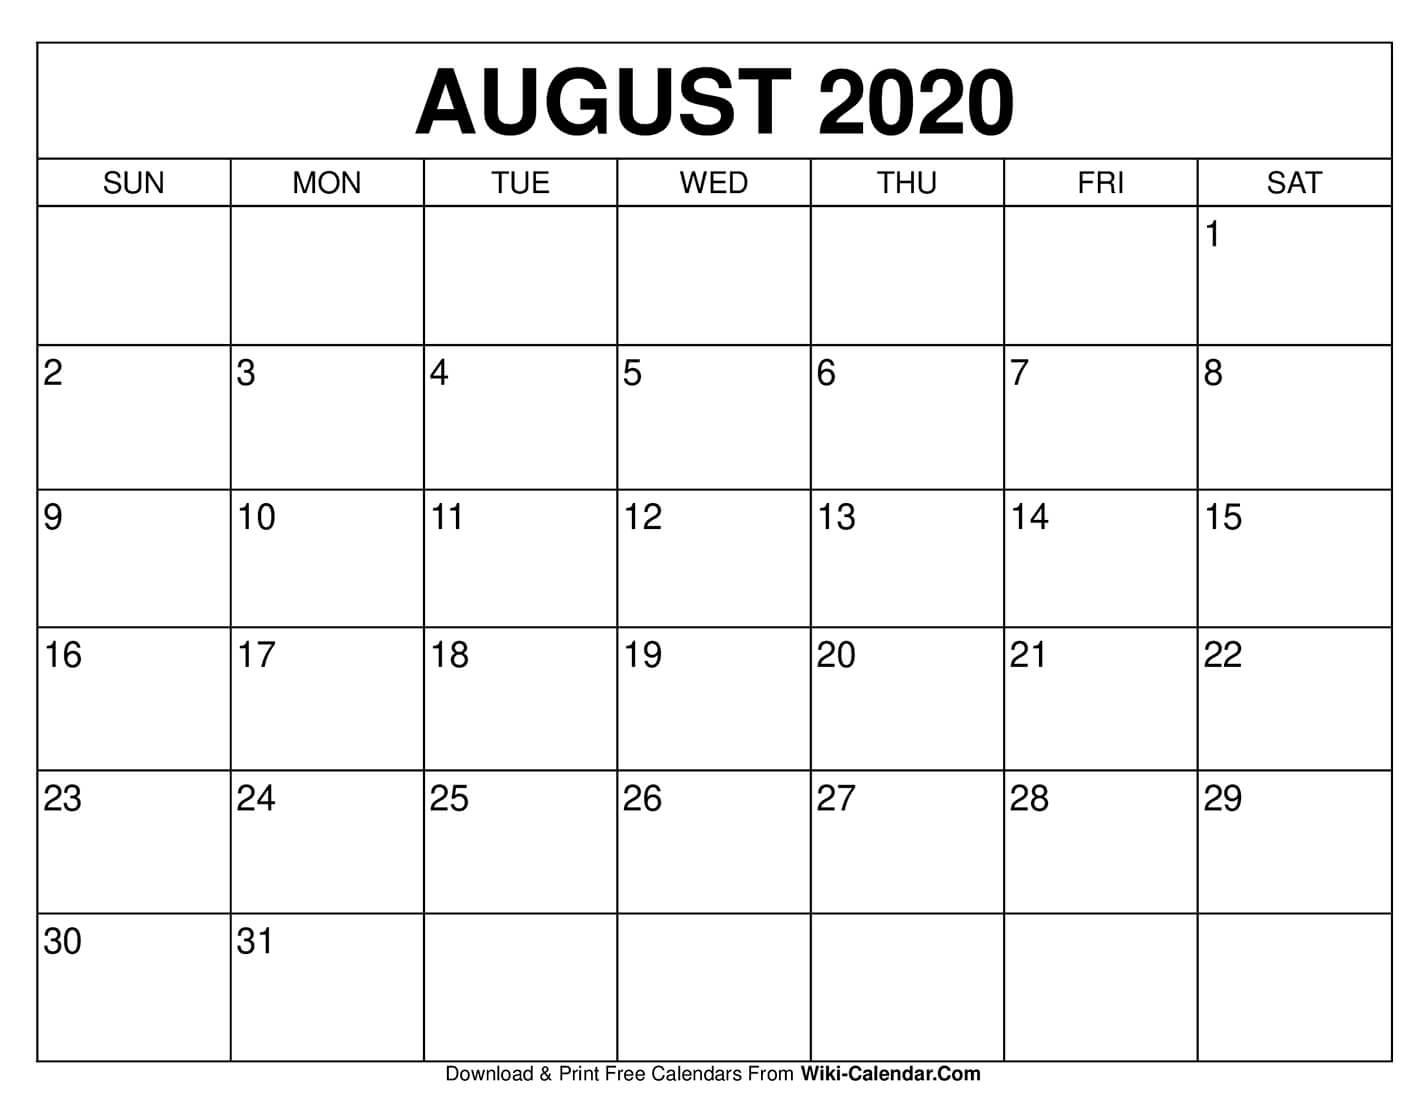 Free Printable August 2020 Calendars with 2020 Calendar Printable Free Pdf Color